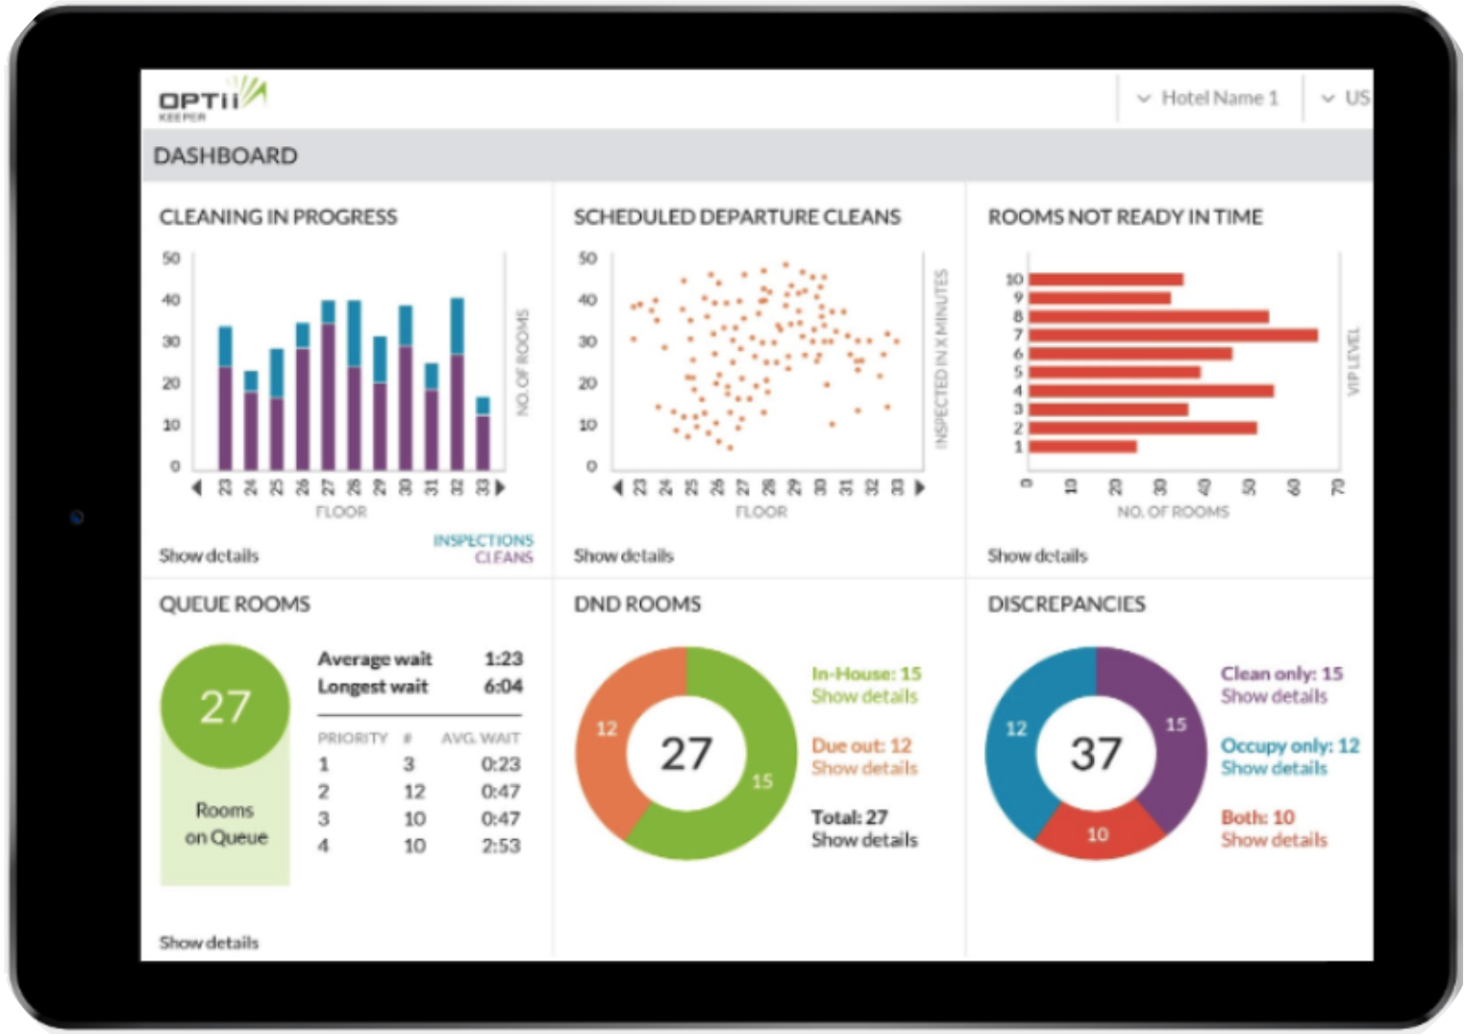 Optii Hotel Housekeeping Management software reports